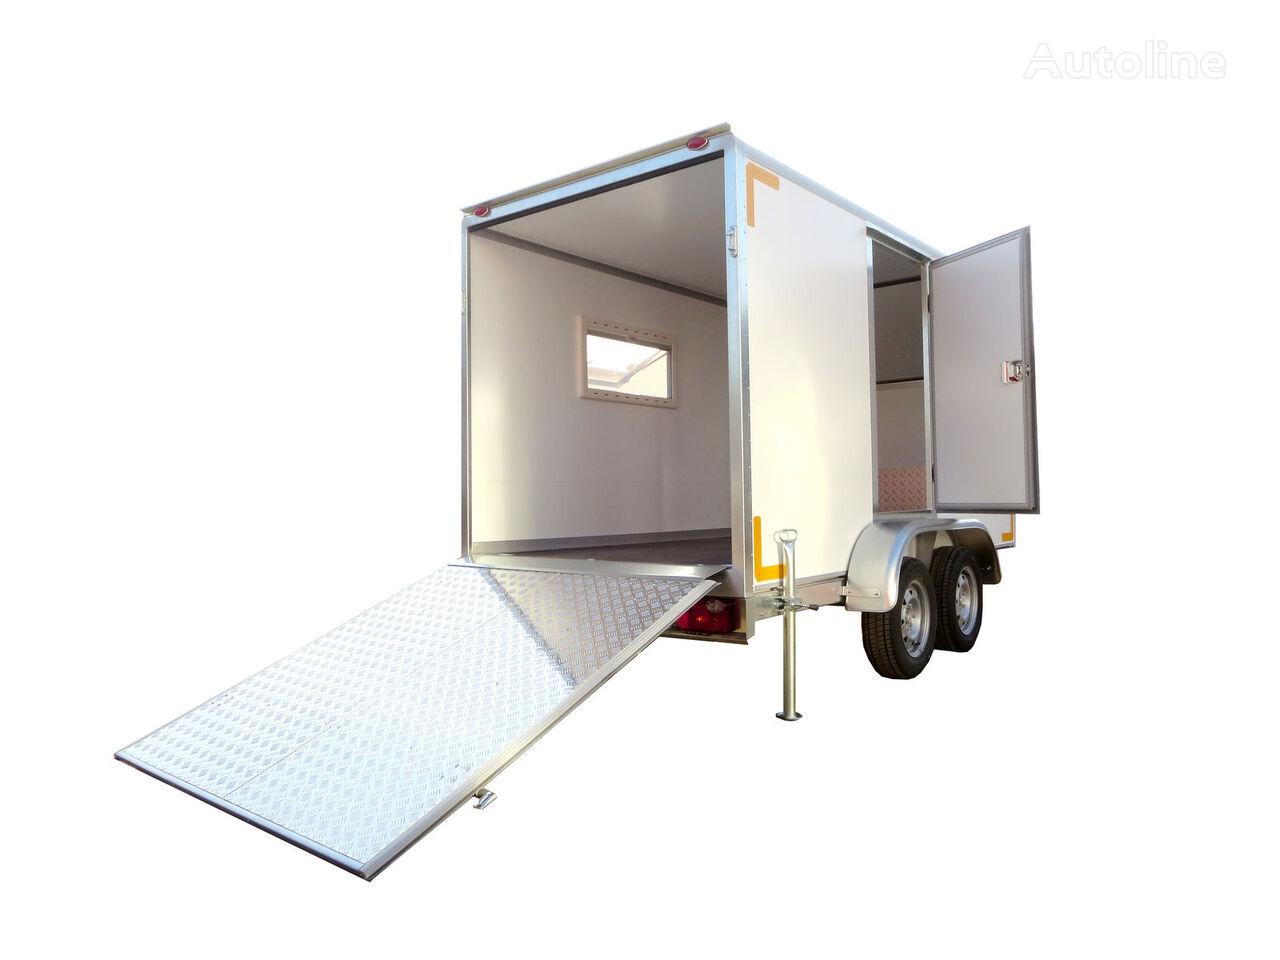 new 3792M4 caravan trailer